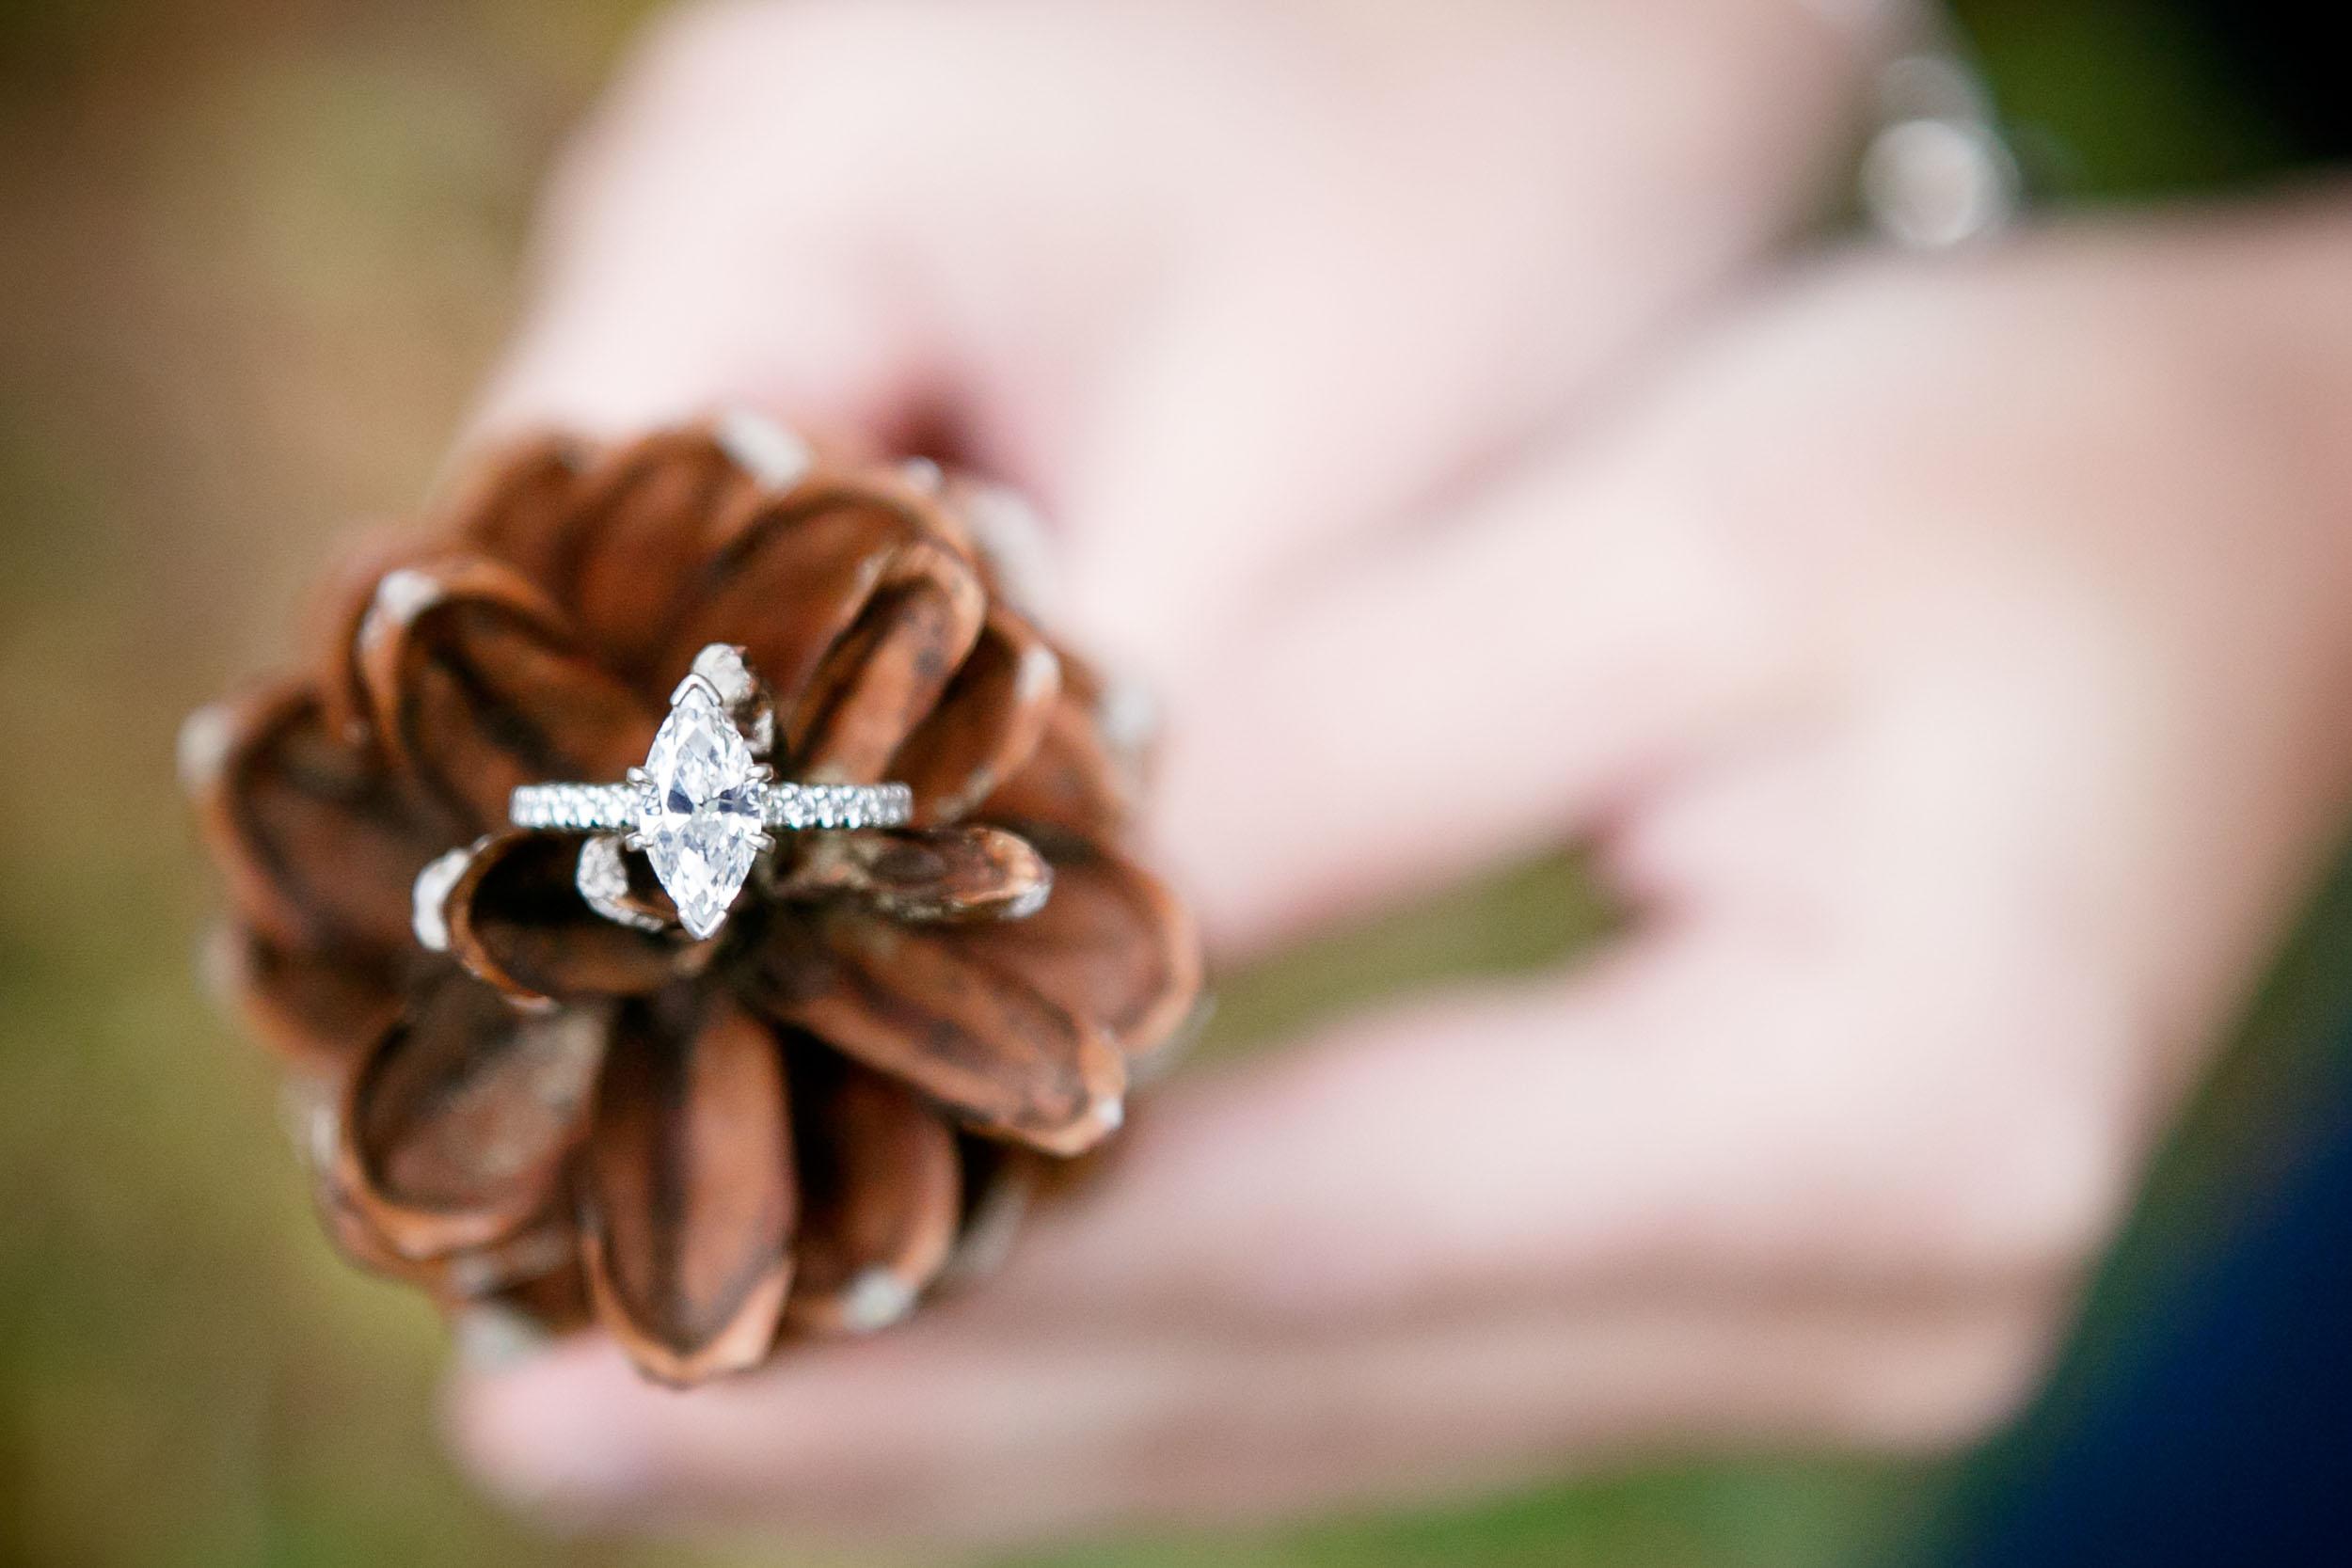 fall-engagement-photos-props--adam-shea-photography-green-bay-appleton-neenah-photographer-7.jpg